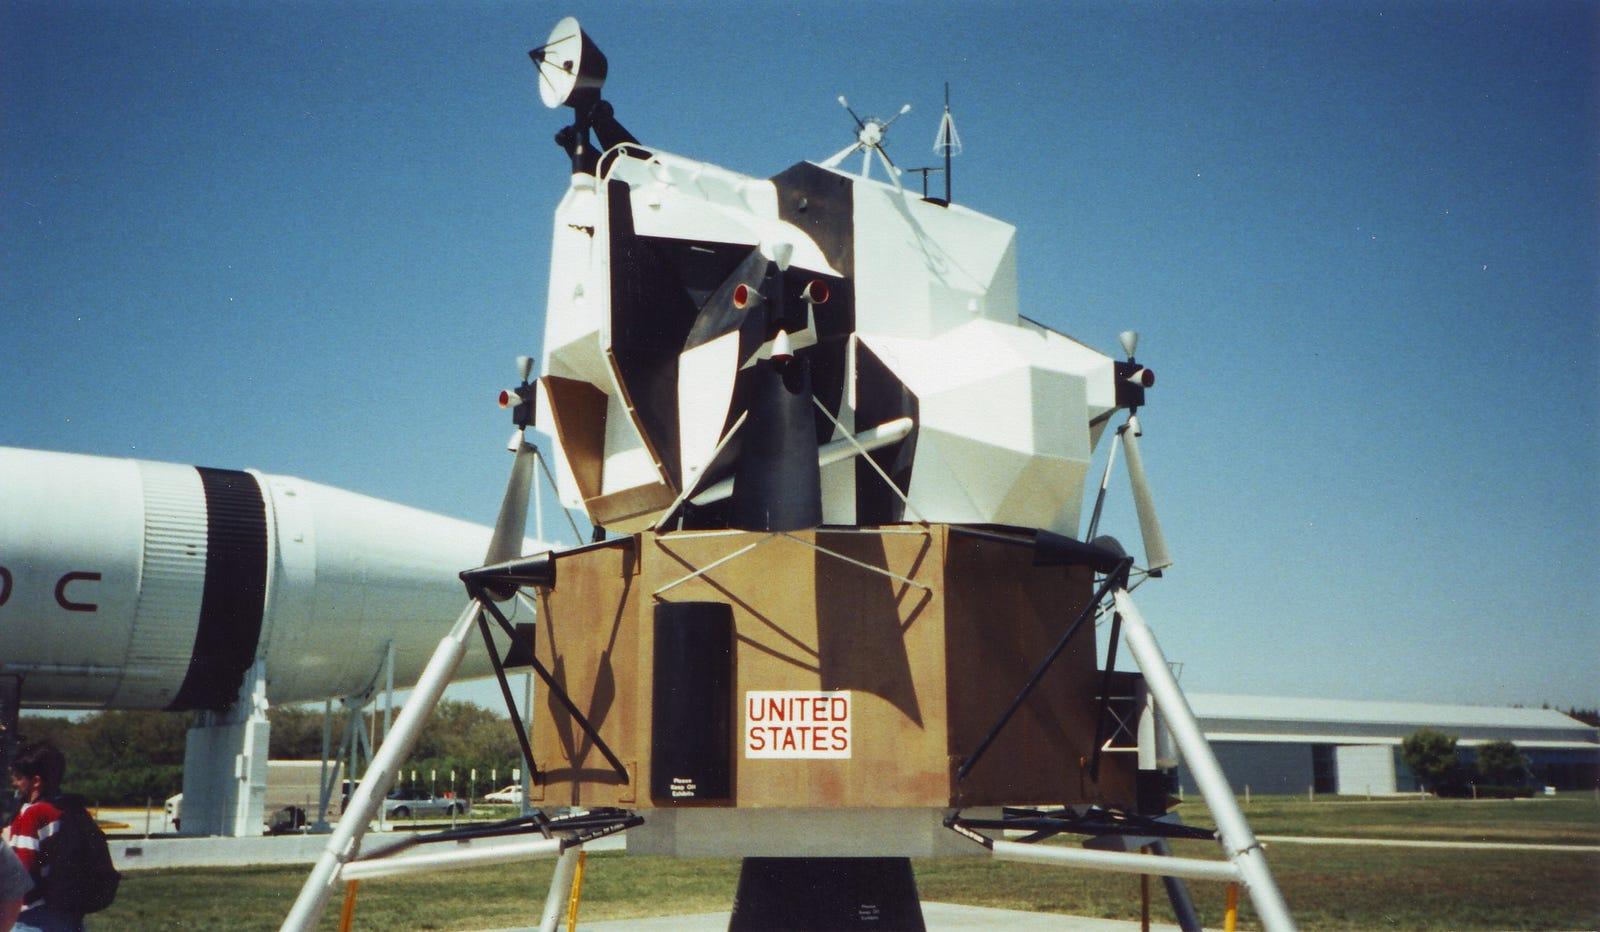 Lunar Lander replica in the KSC Rocket Garden. In the background is a Saturn 1B